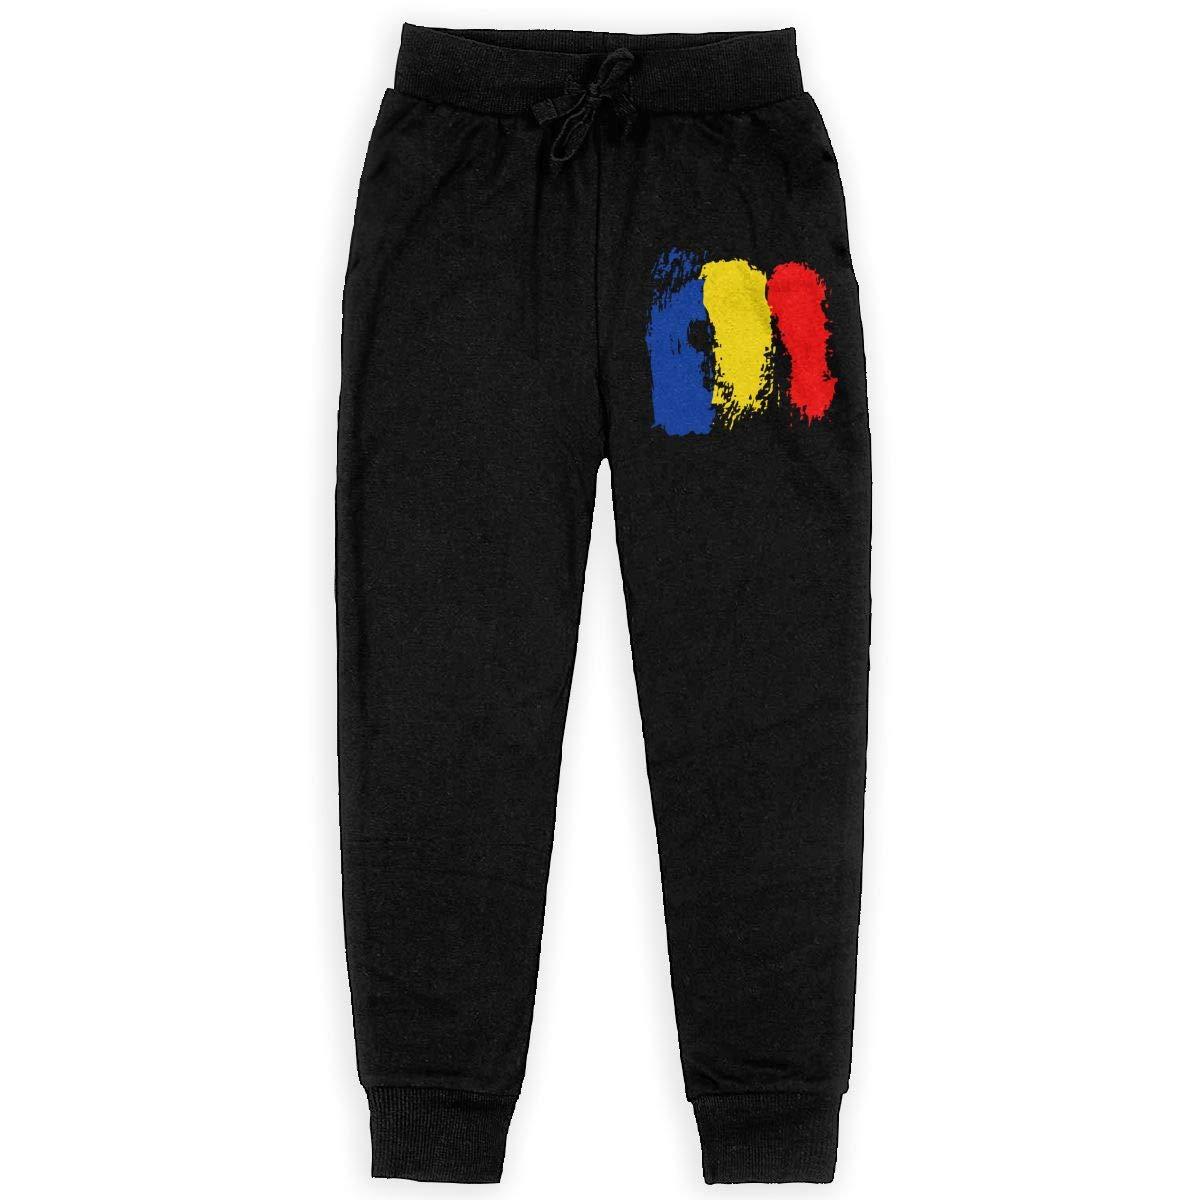 Girls Fleece Pants for Teenager Boys WYZVK22 Romanian Flag Soft//Cozy Sweatpants